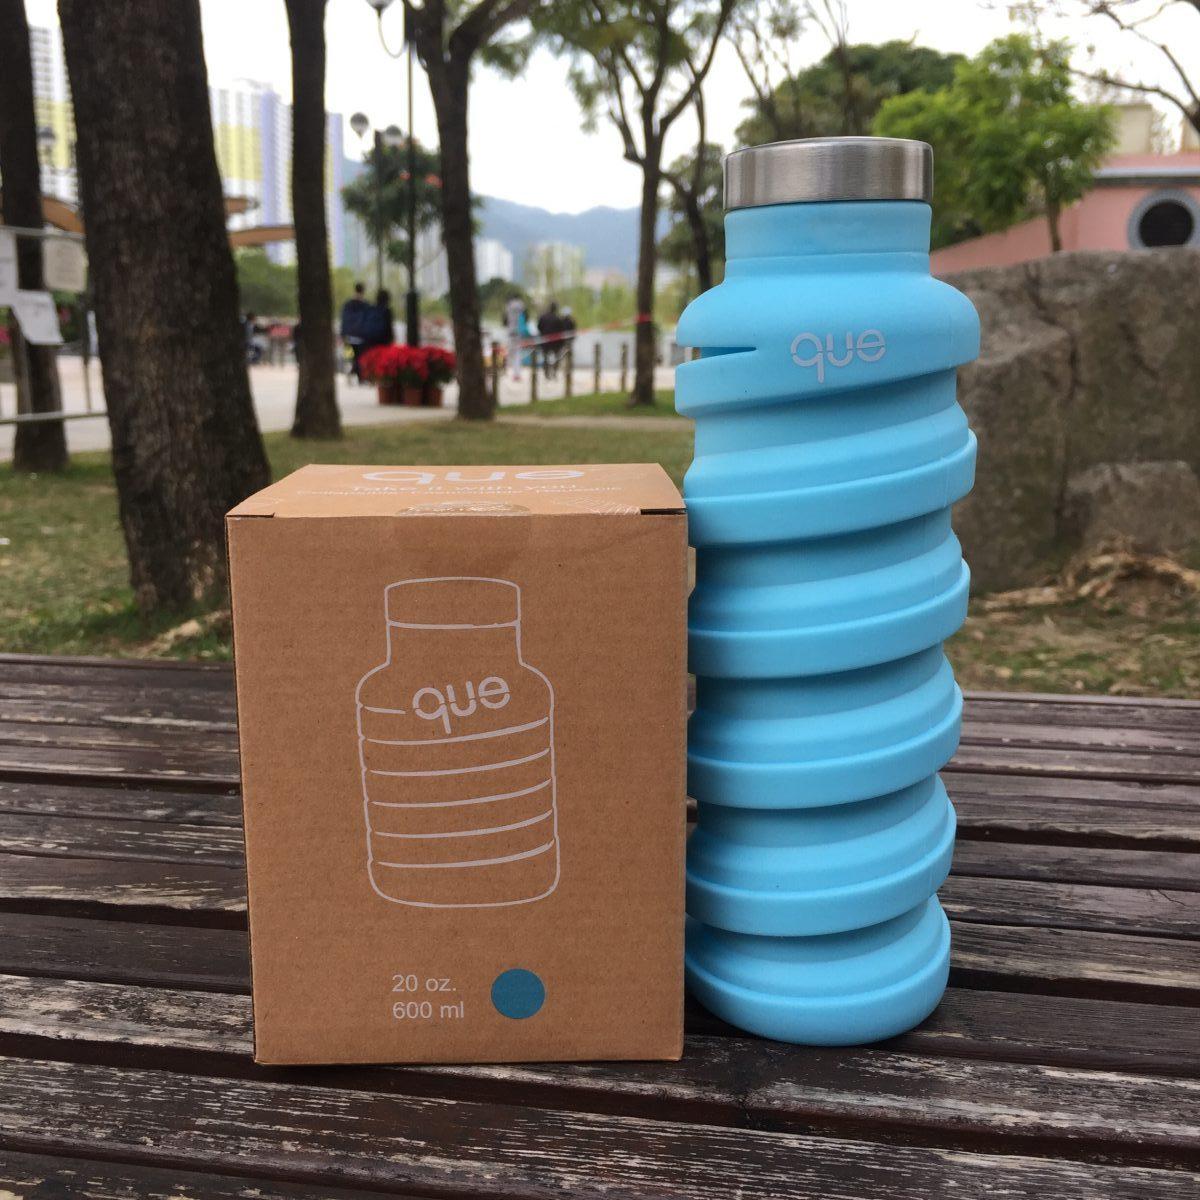 Que Bottle 伸縮矽膠水壺 Collapsible Travel Water Bottle 20oz